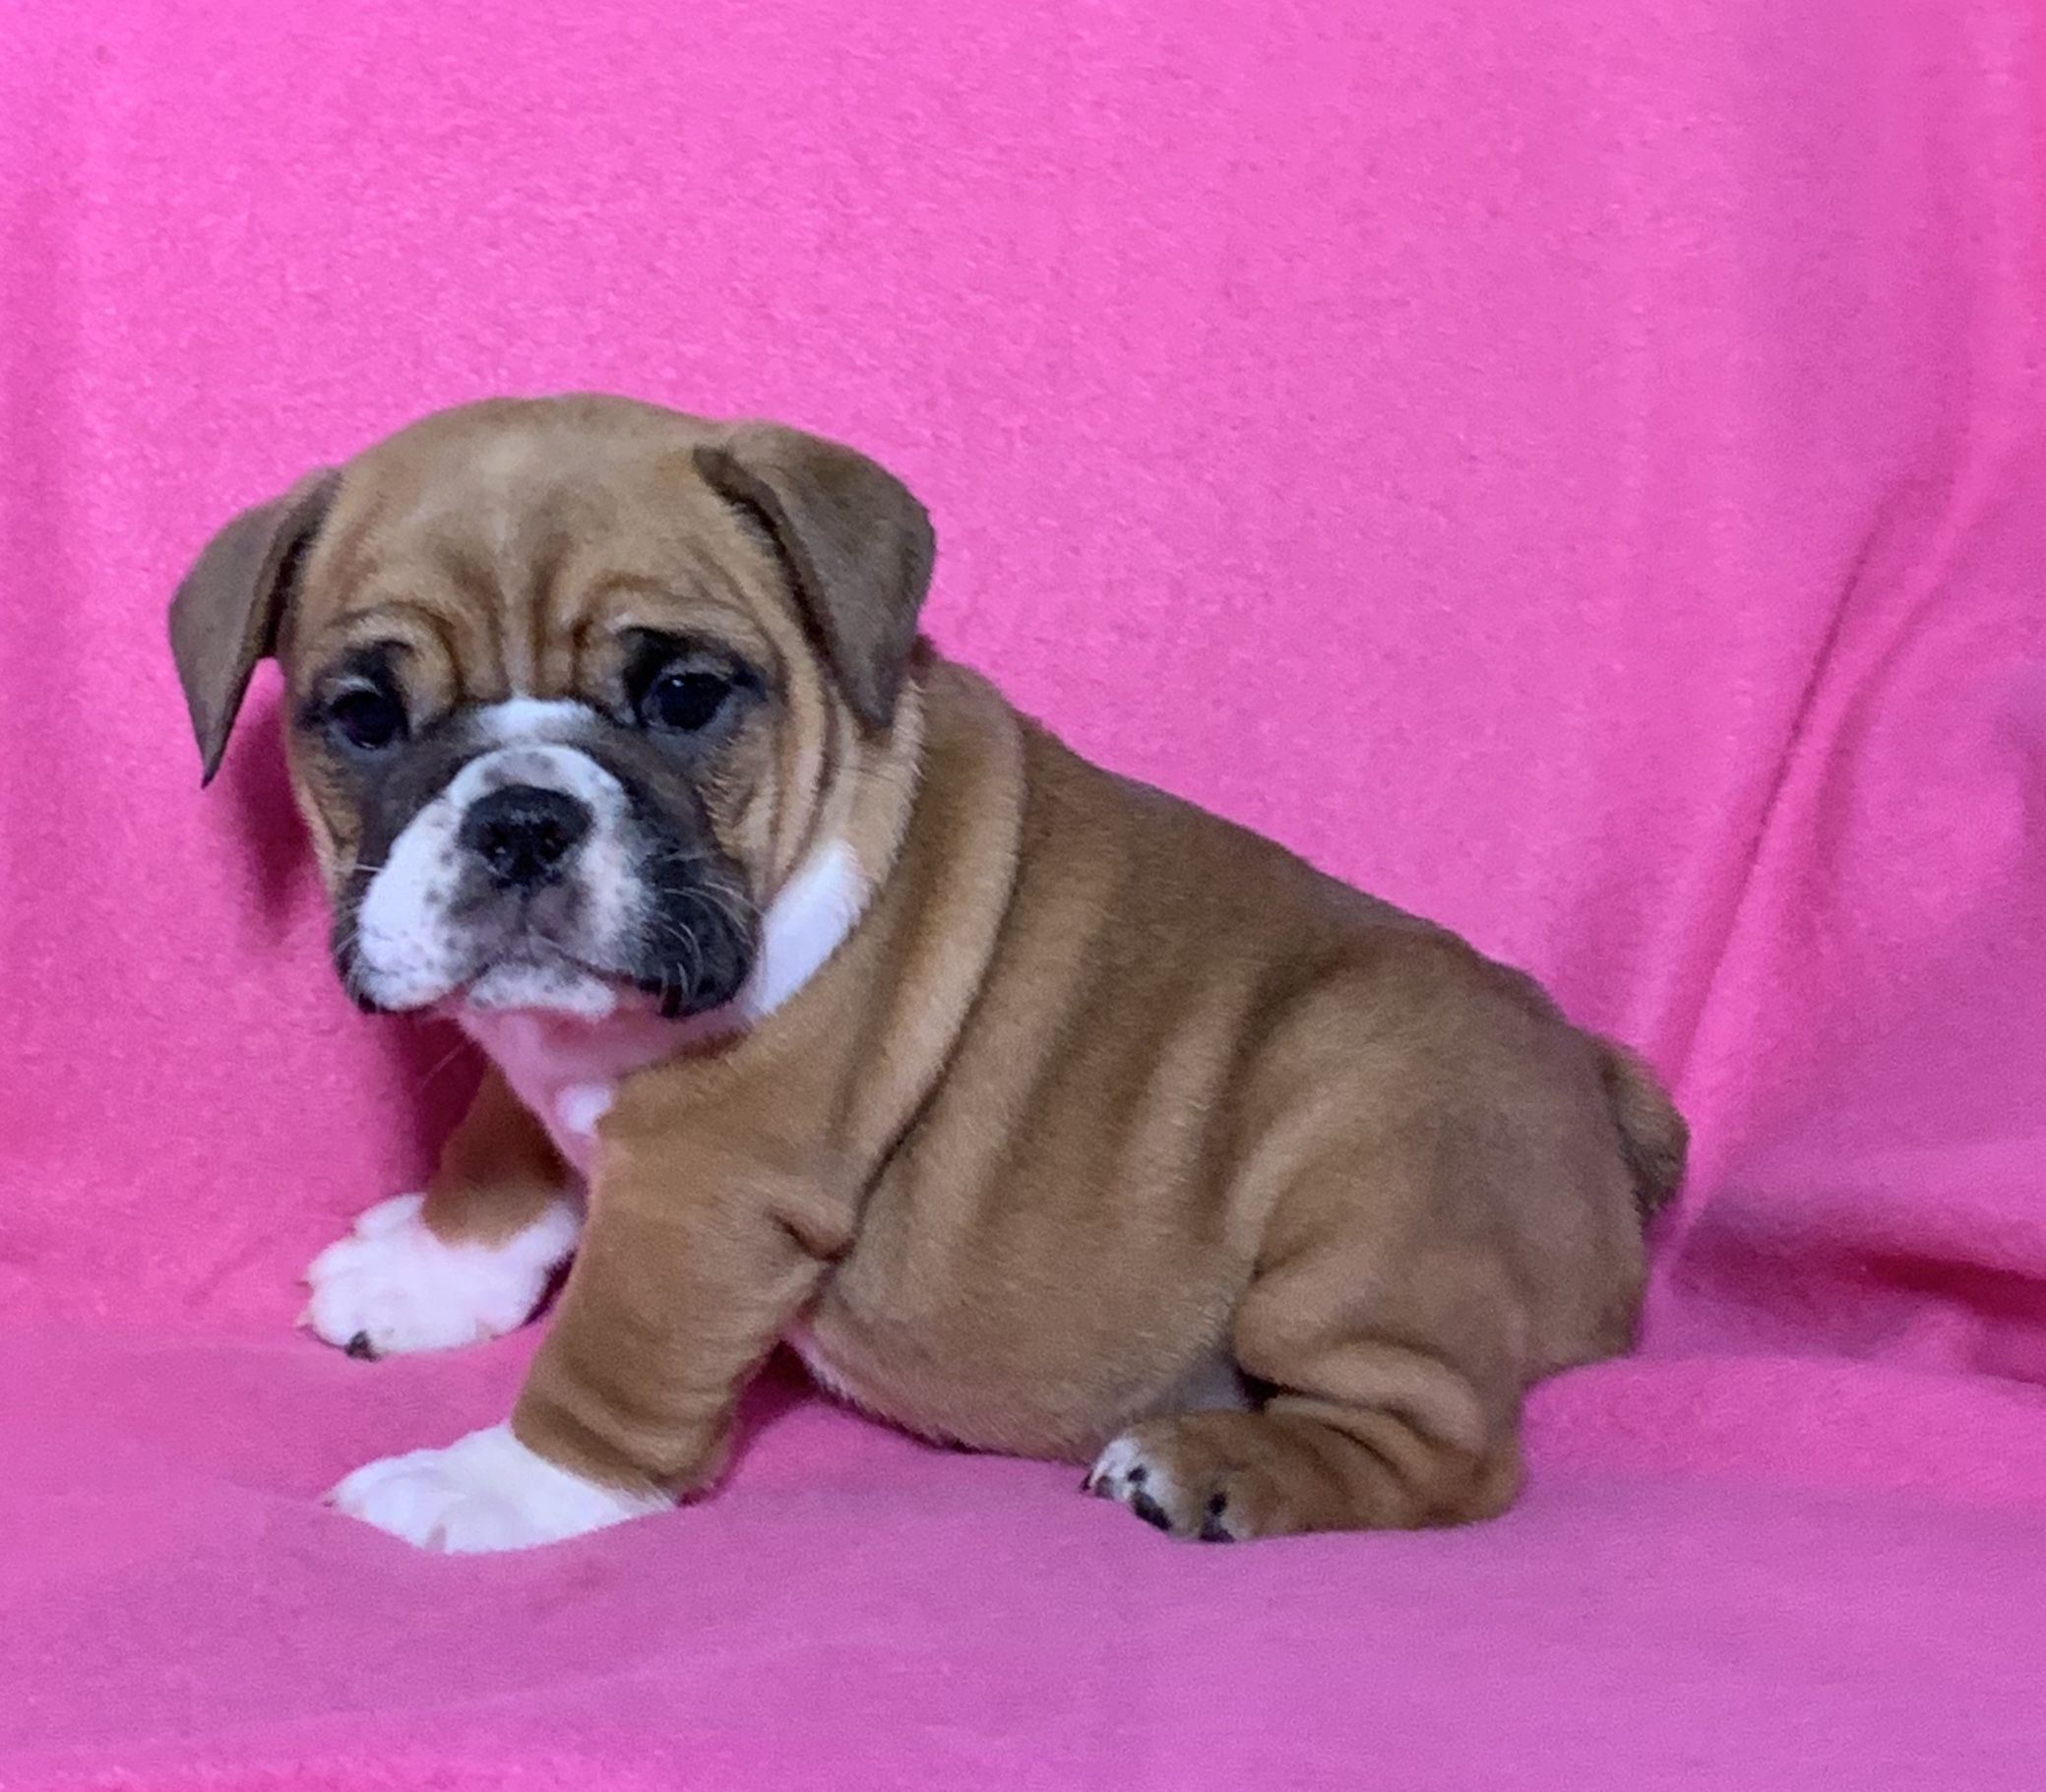 Sweet Beabull In 2020 Lancaster Puppies Cute Animals English Bulldog Puppy